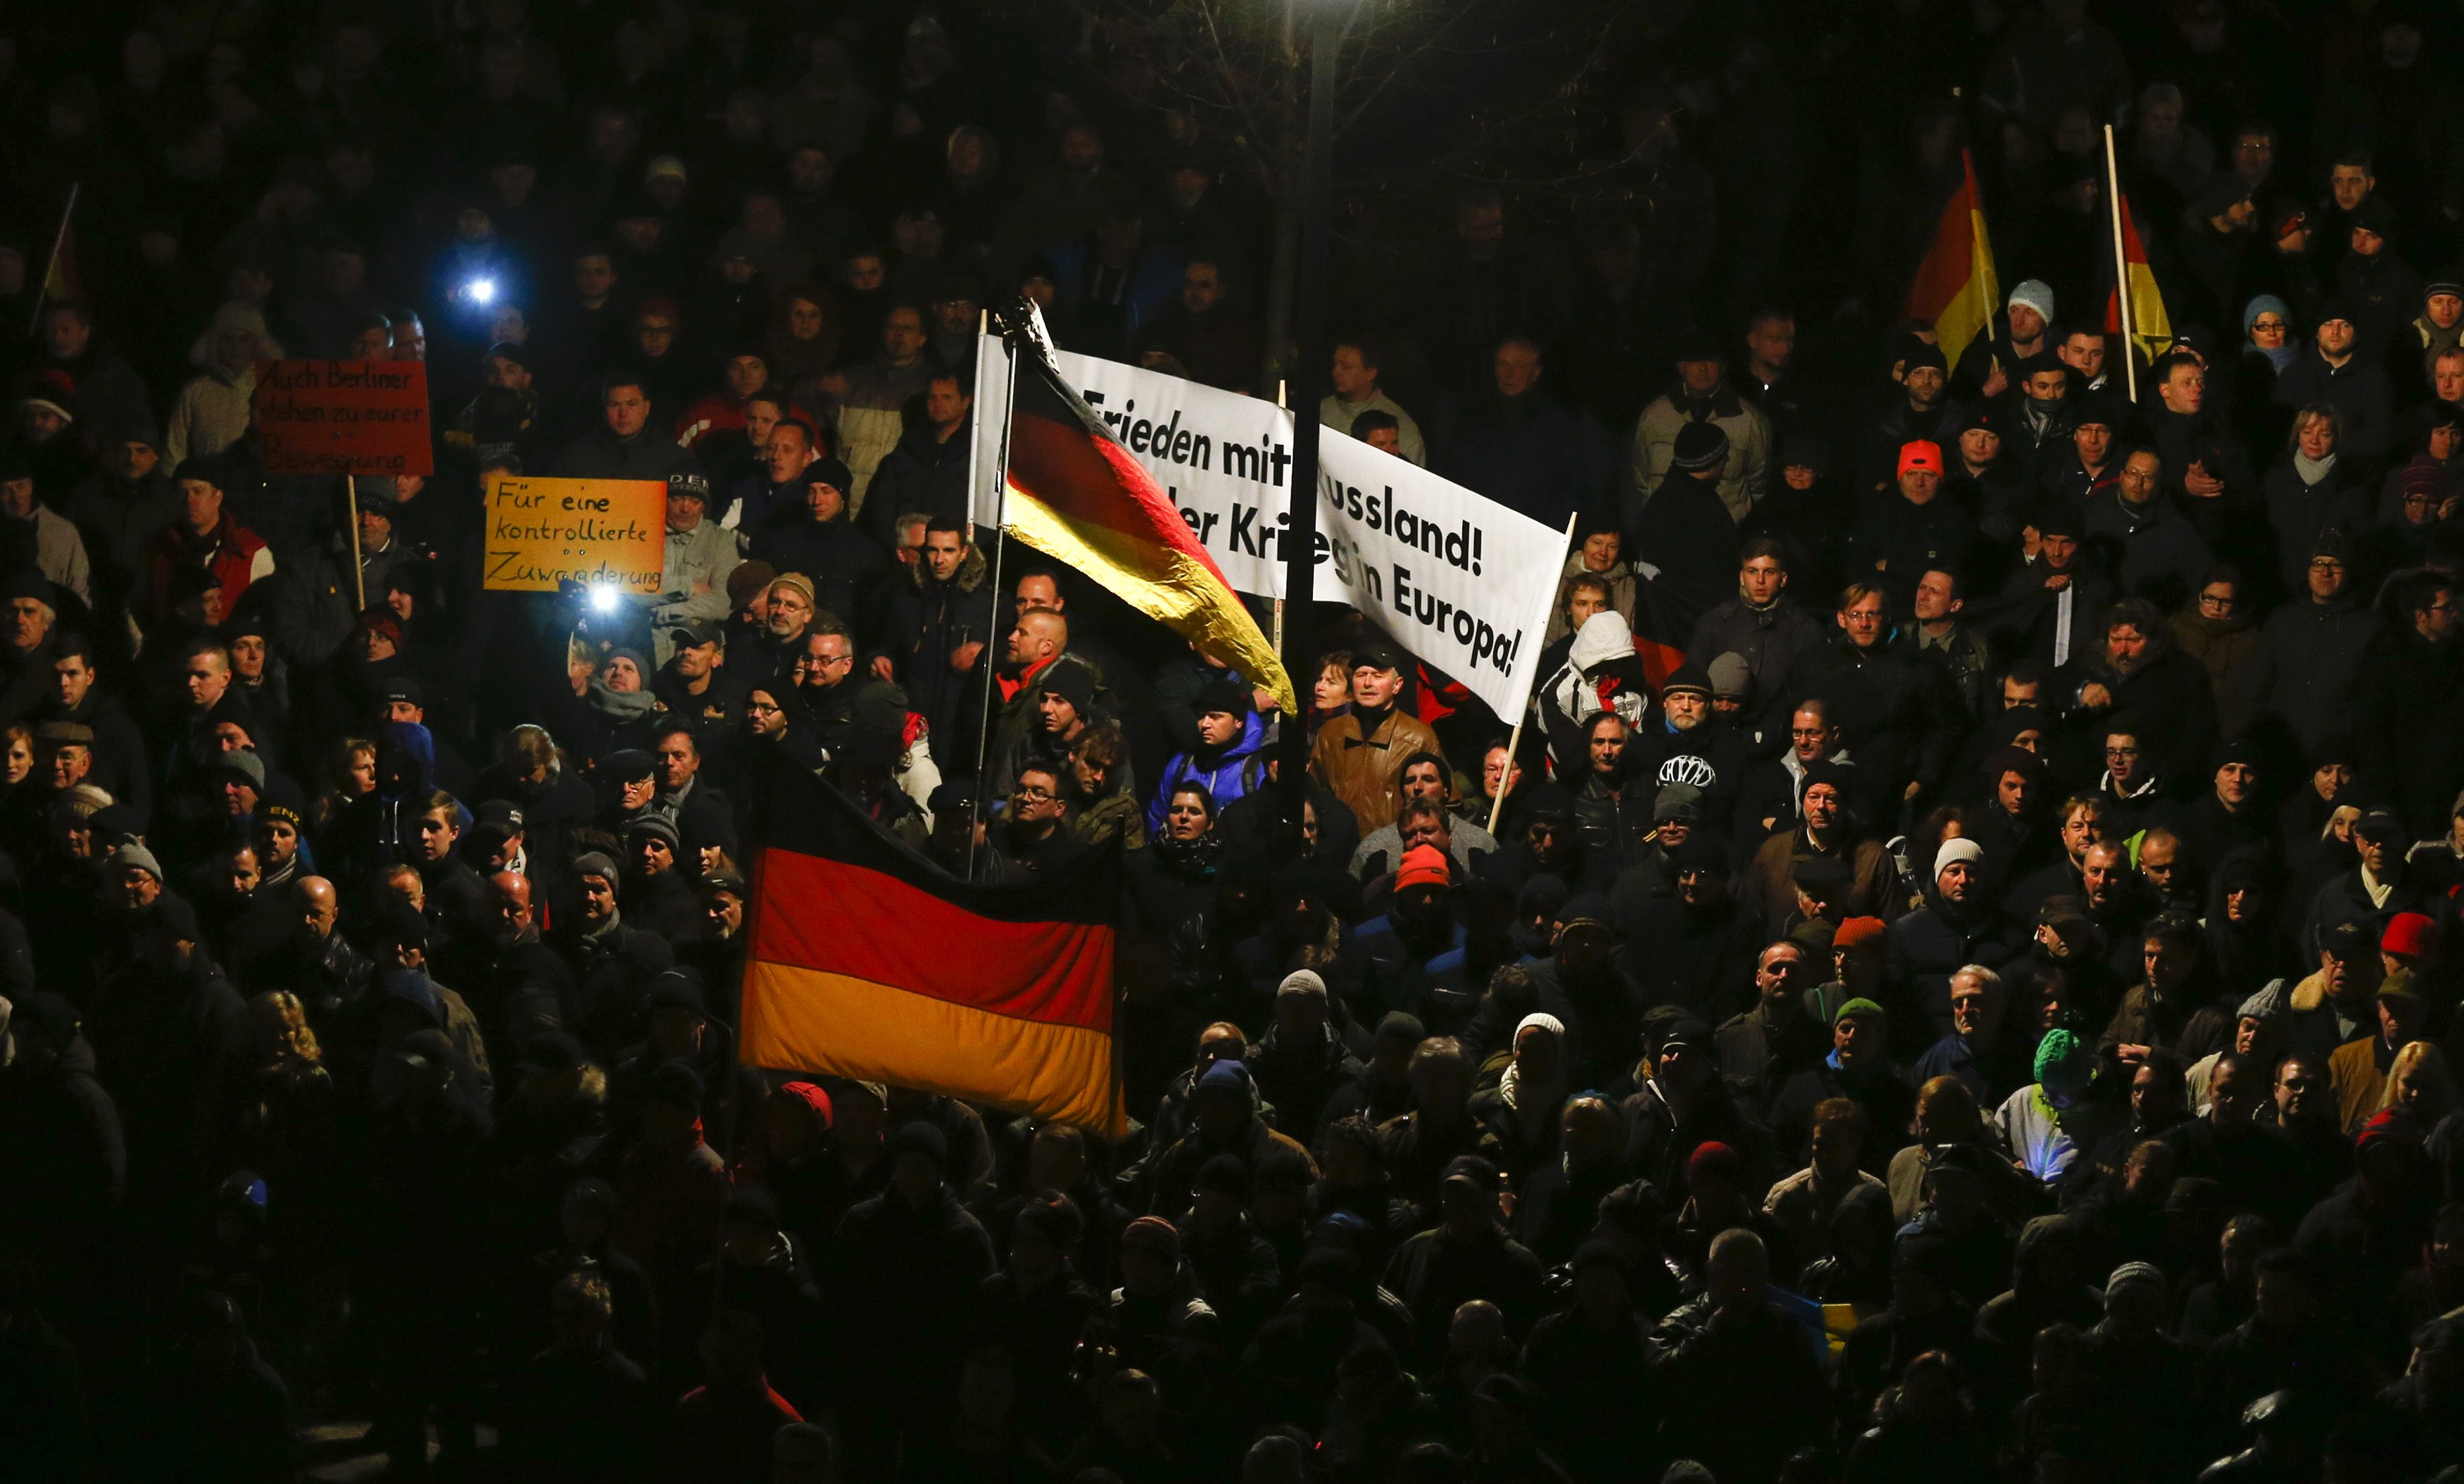 Islamophobic crimes on the rise in Europe :Europe